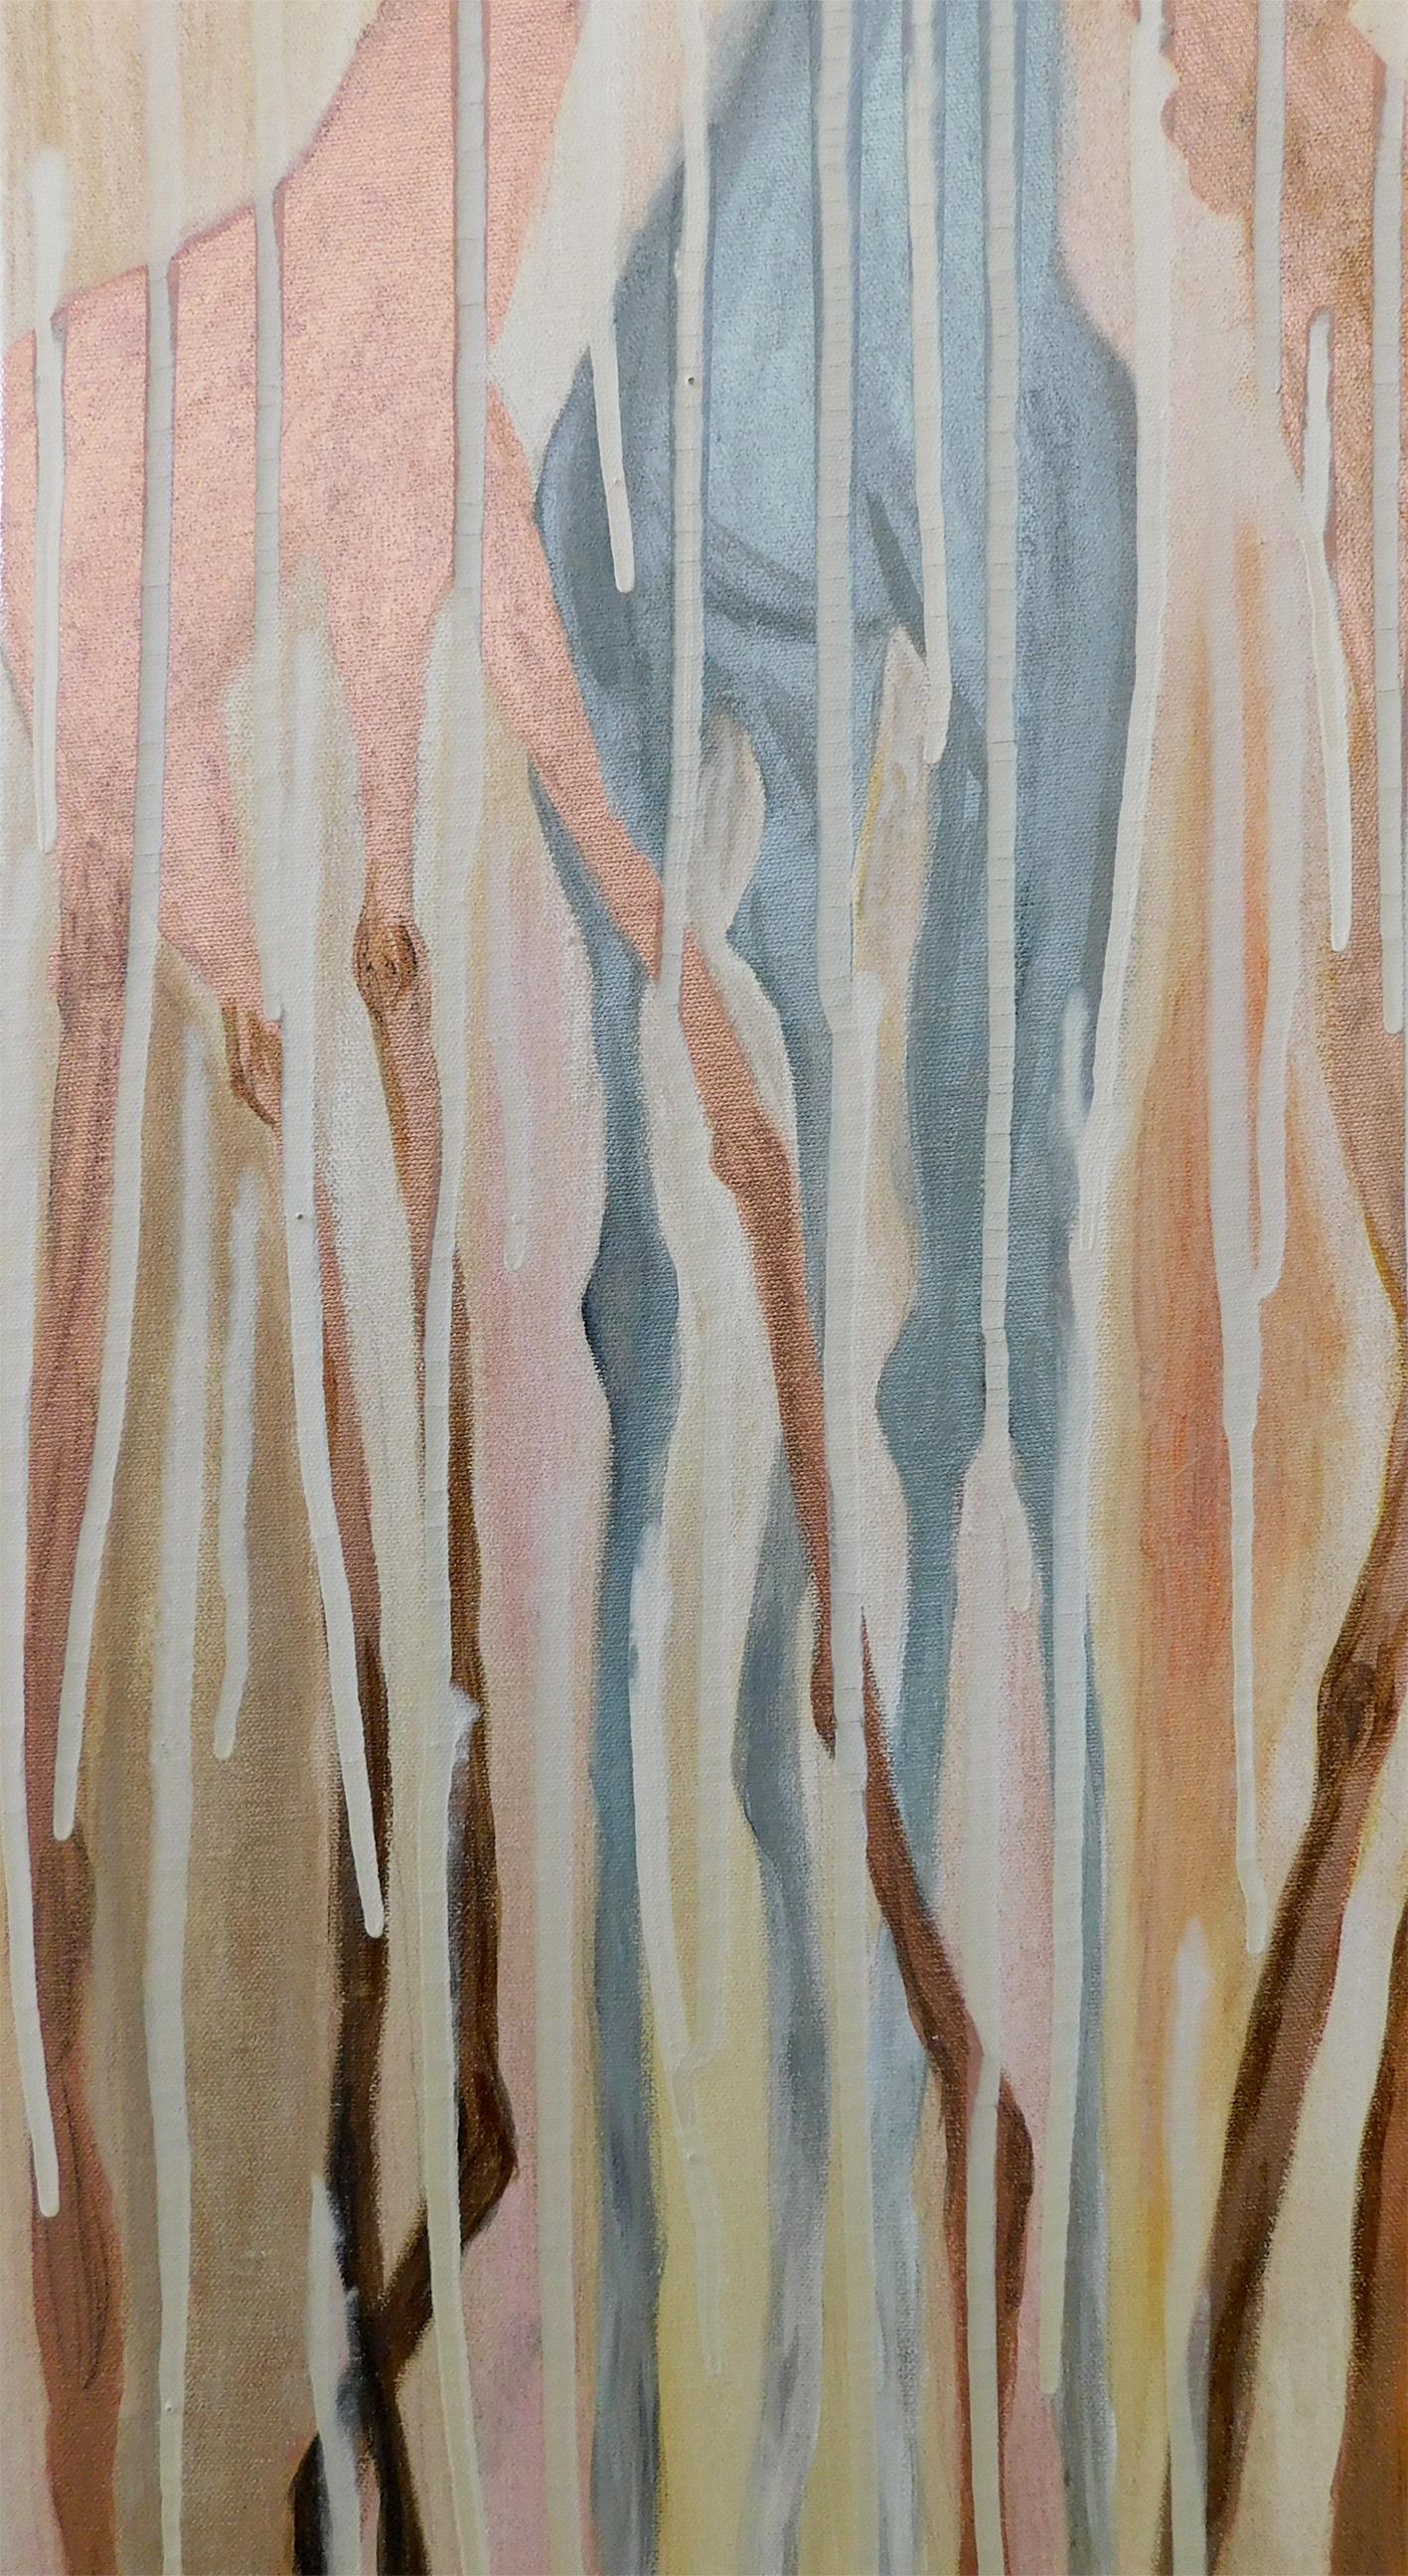 Roaming Ruminants Natalie Daghestani Art Dubai Artist BSAB2